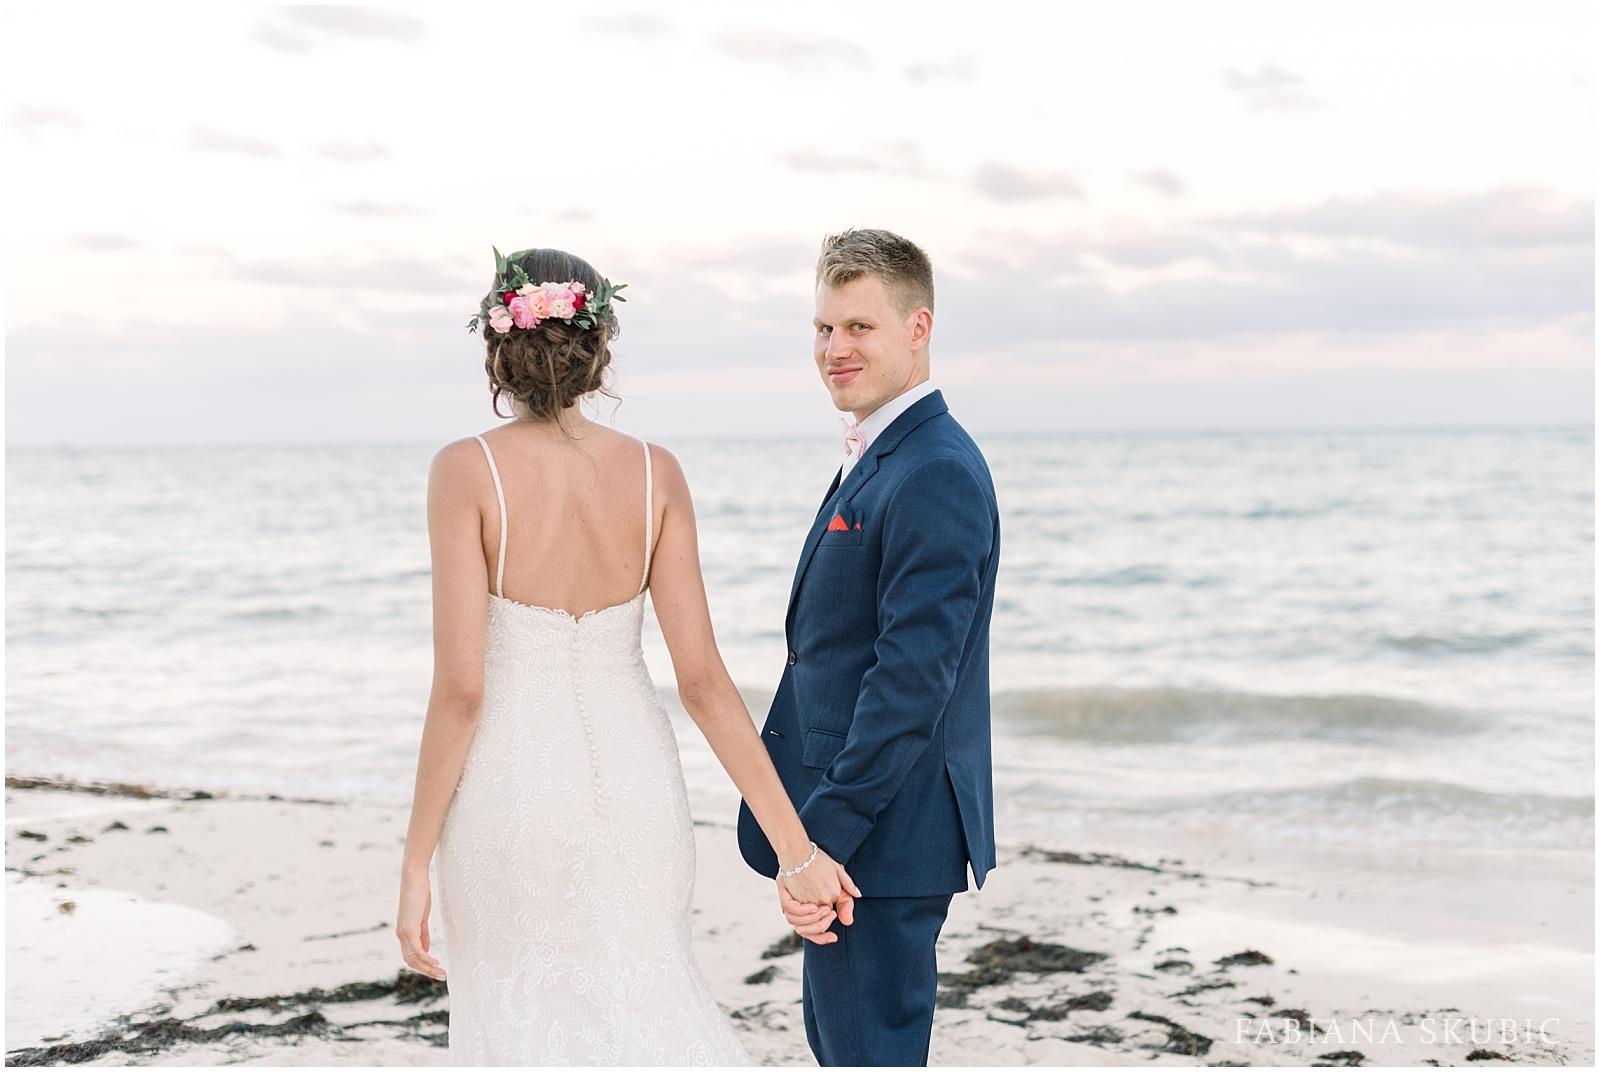 TJ_Now_Sapphire_Riviera_Cancun_Mexico_Wedding_Photos_0275.jpg